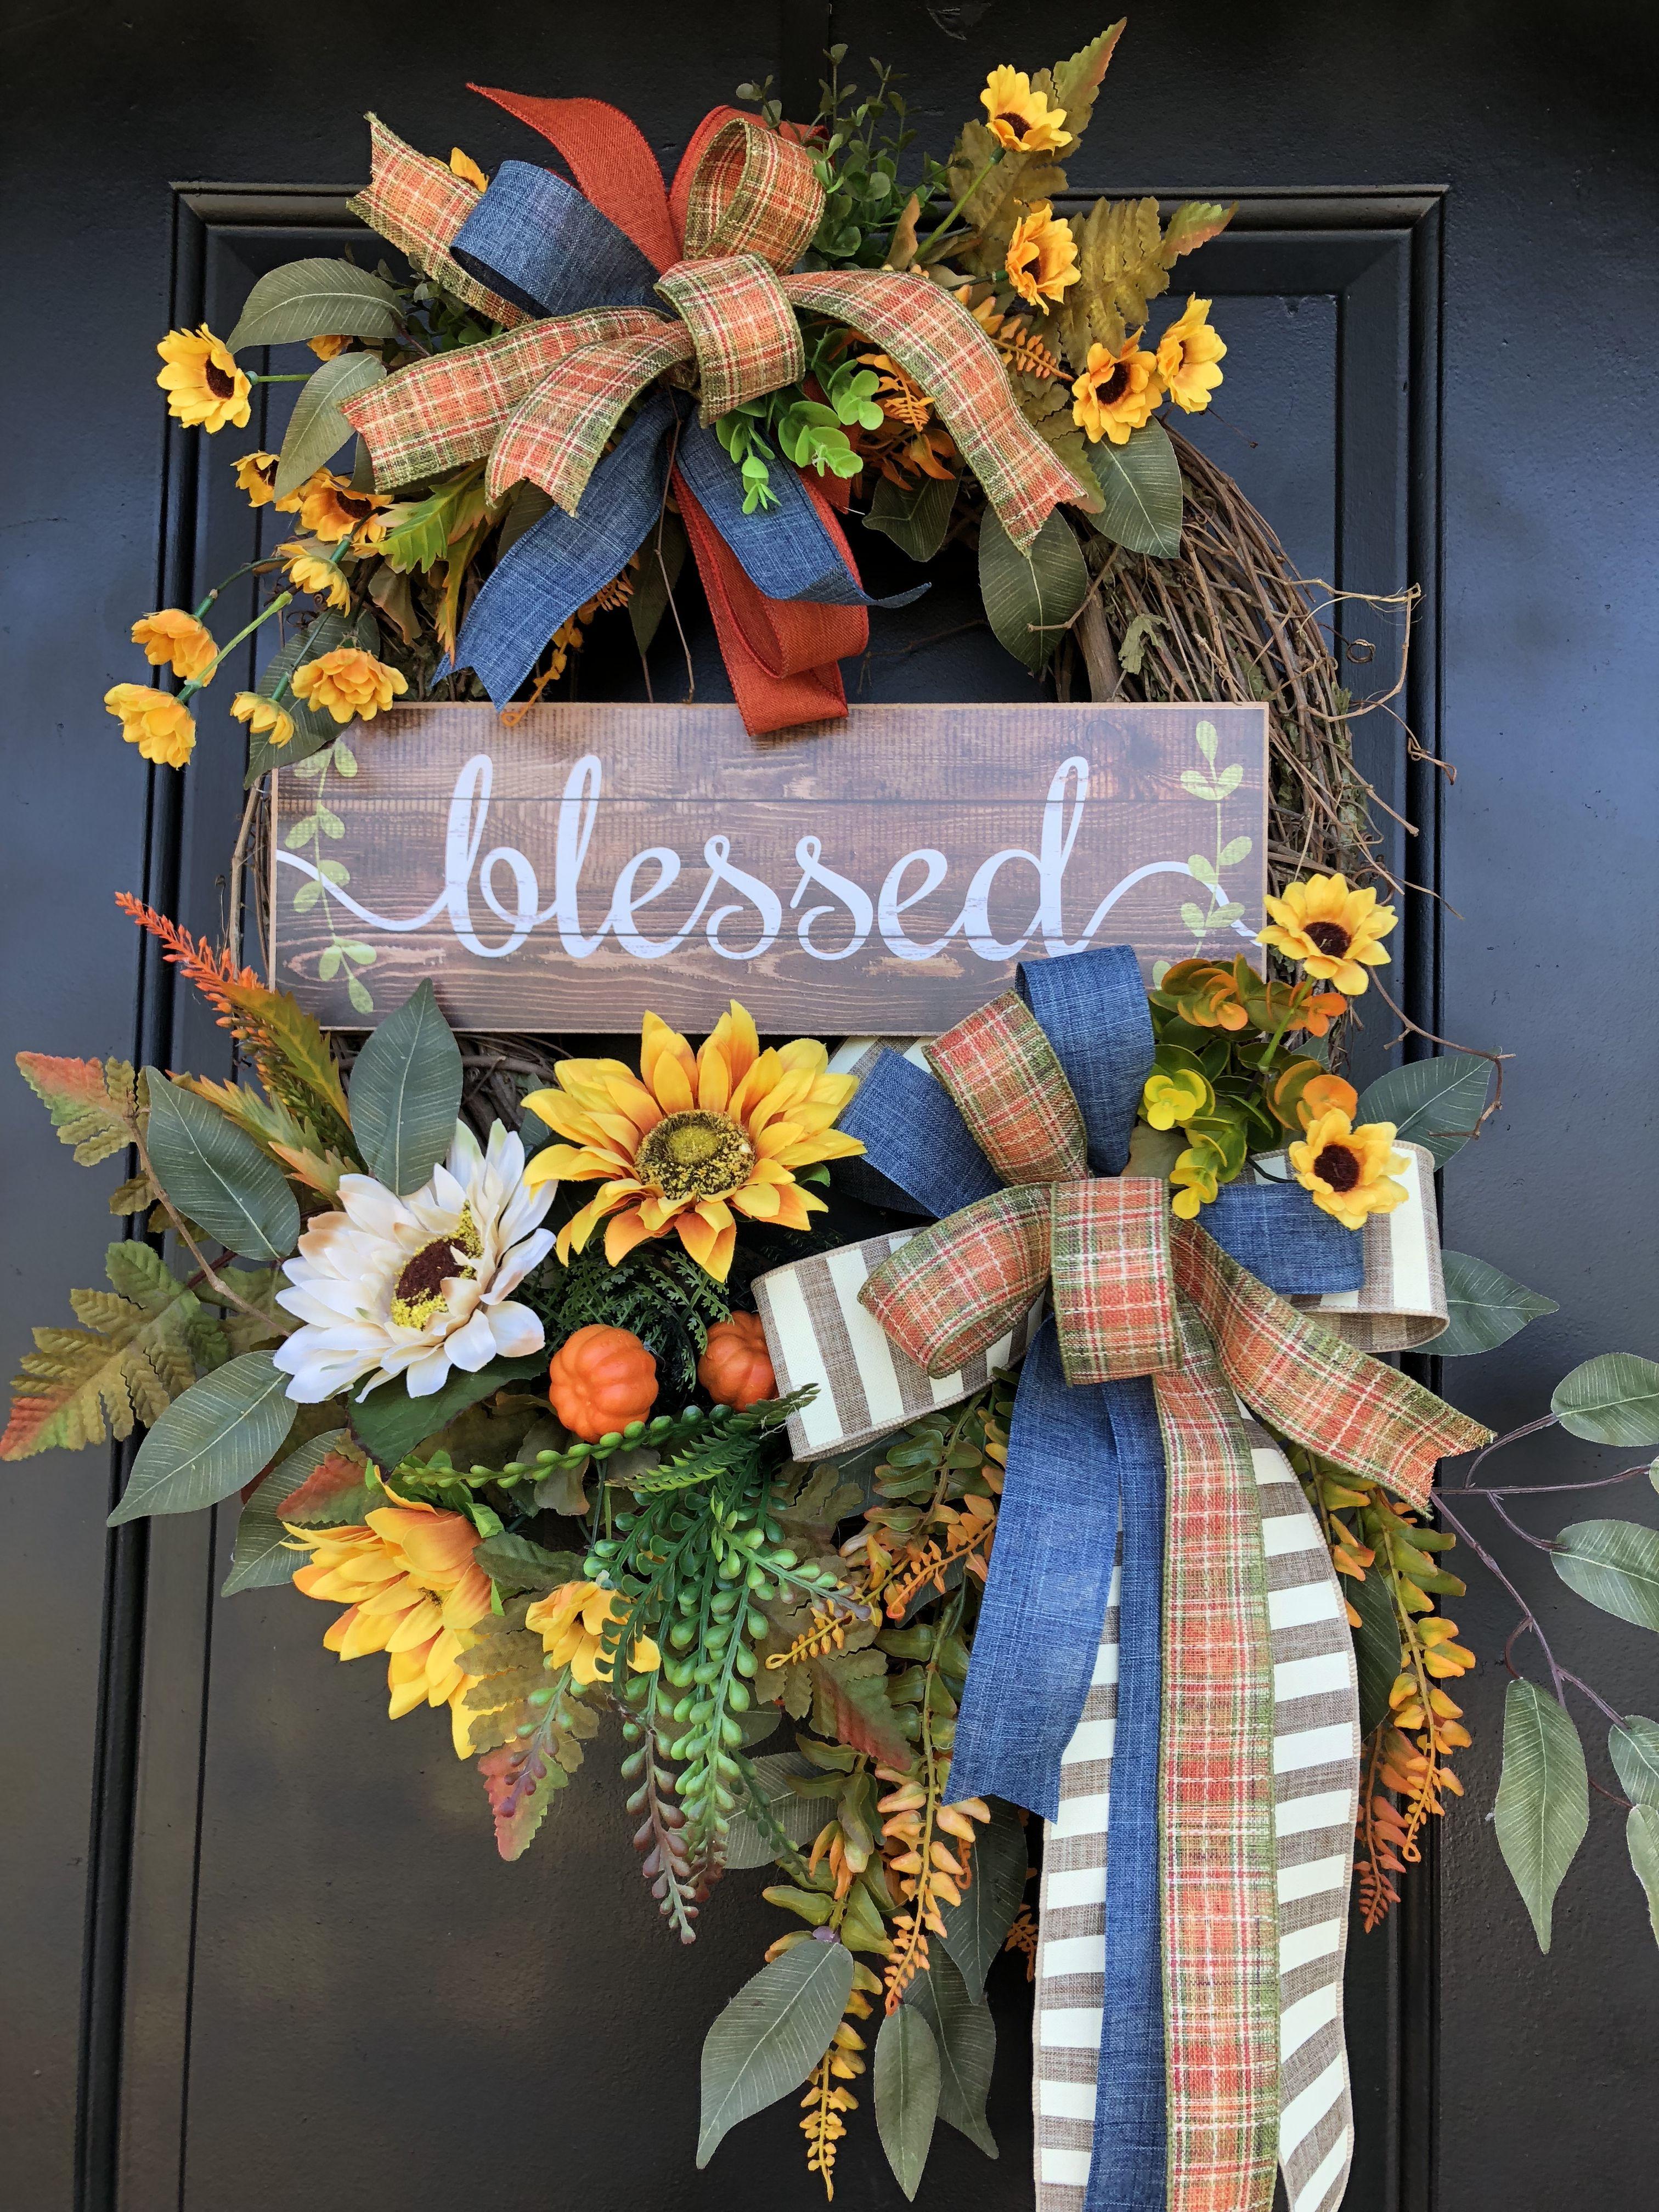 Pin By Sassy Doors On Sassy Doors Fall Wreaths Thanksgiving Wreaths Fall Diy